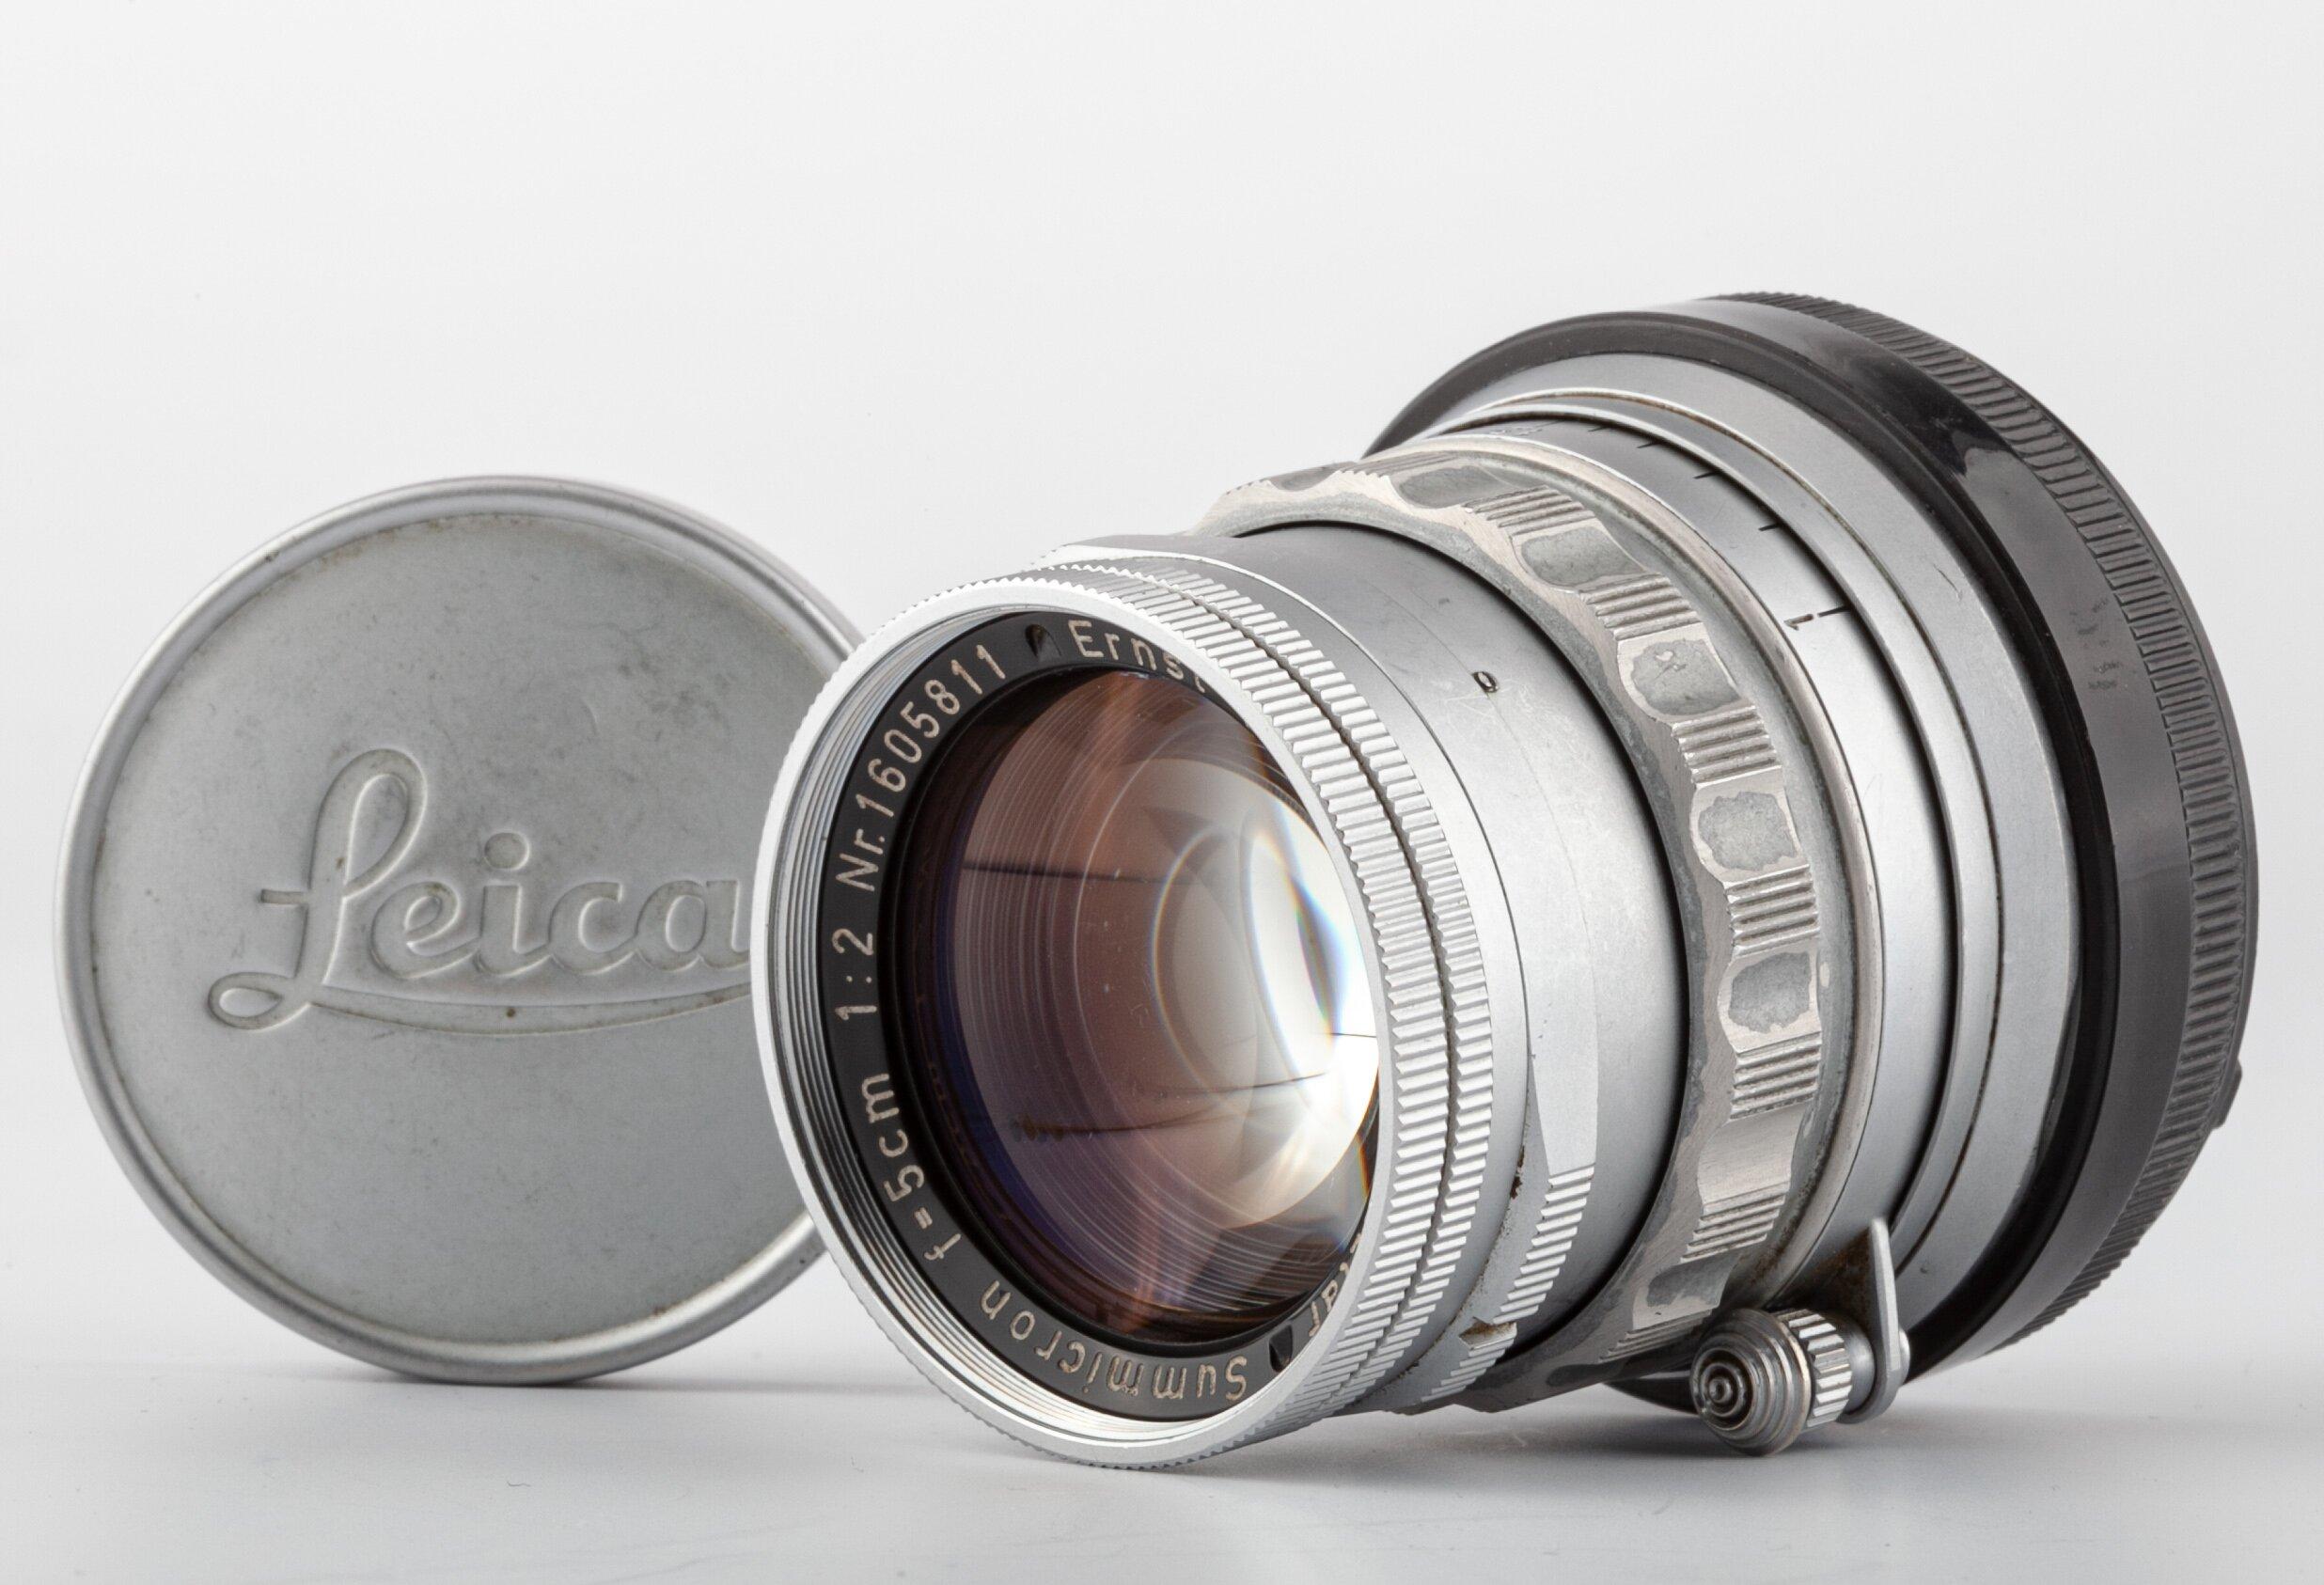 Leitz Leica M Summicron 5cm F2.0 Chrome